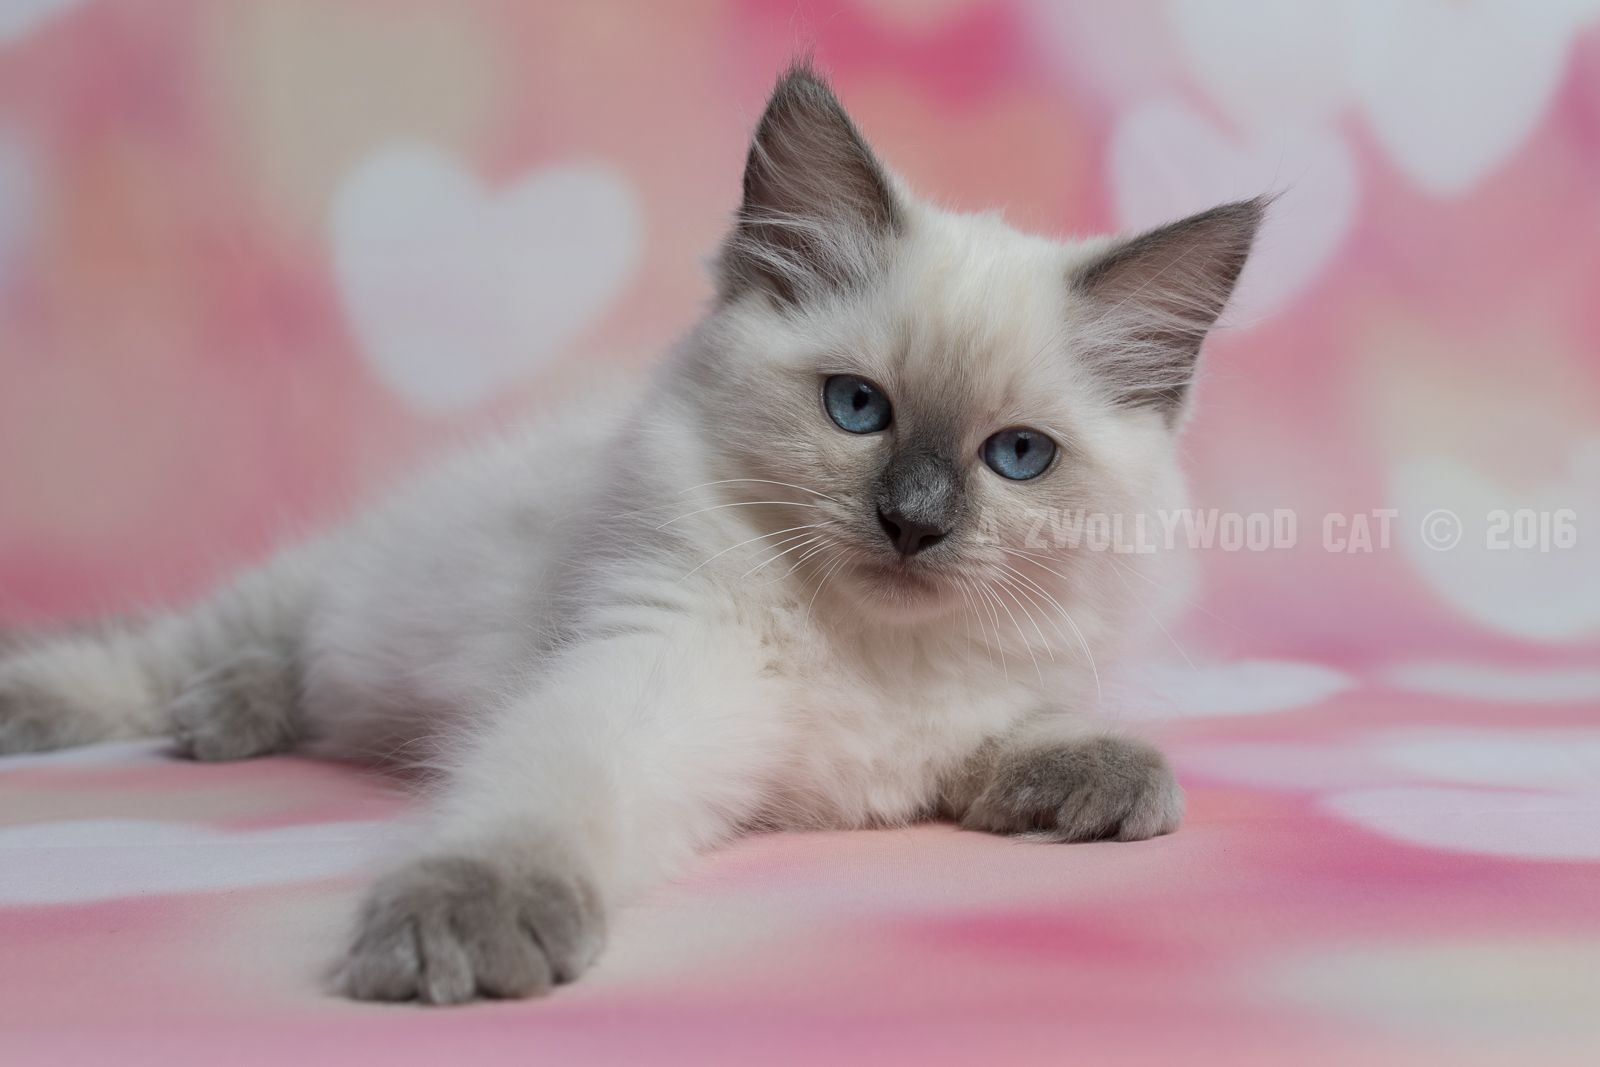 2016 Saphira A Zwollywood Cat 12 Weeks Old Ragdoll Kitten Blue Colourpoint Eragon Litter Katten